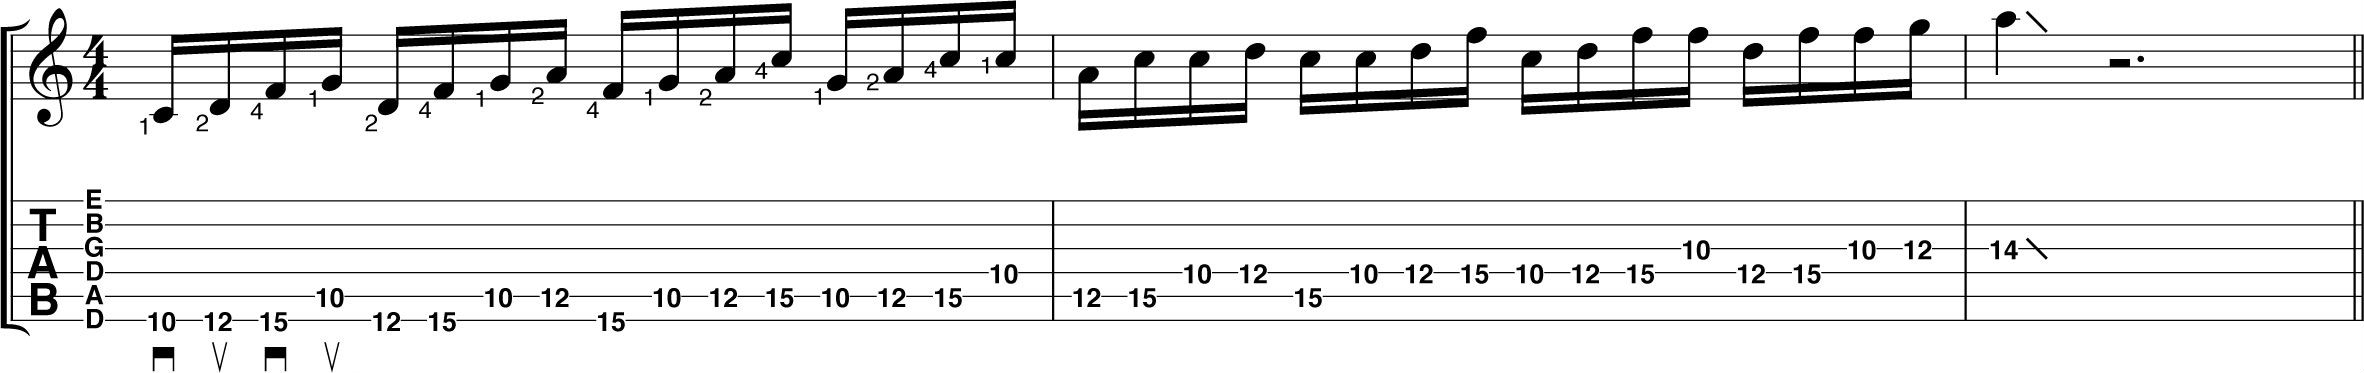 alexi-laiho-razminka-ex-8